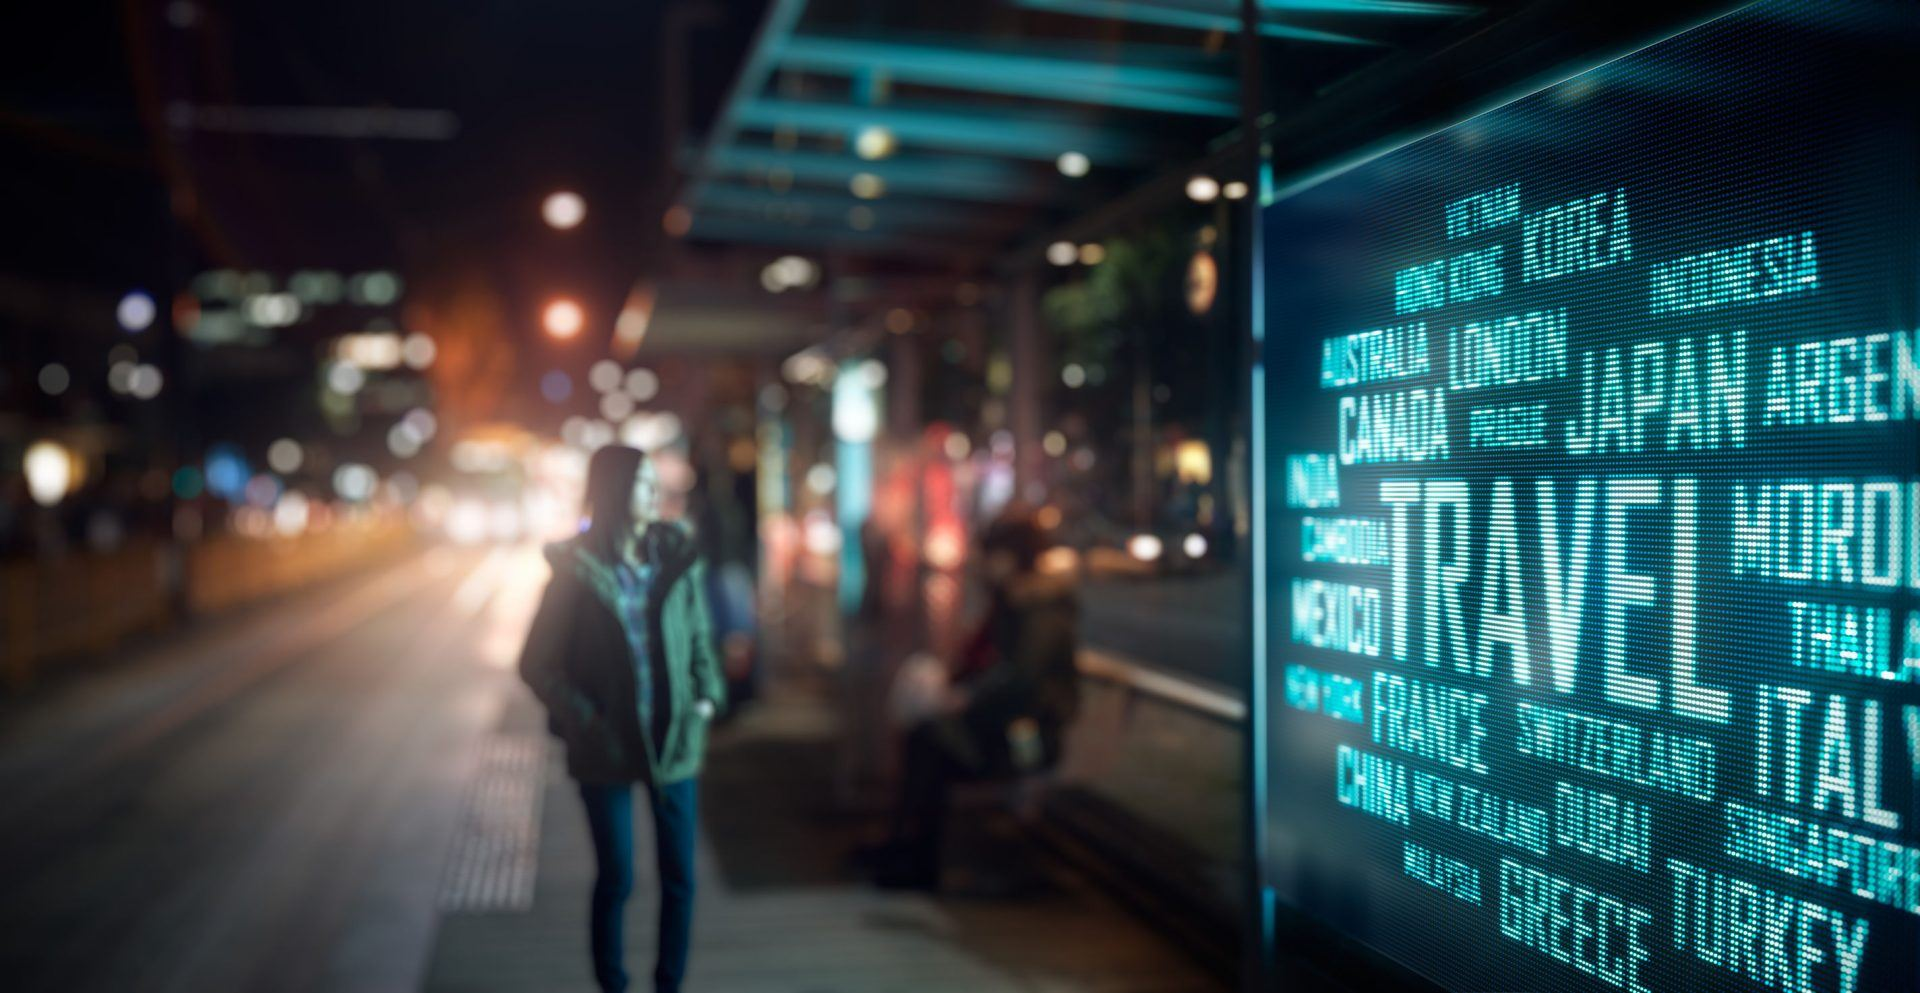 Visual retail and digital signage